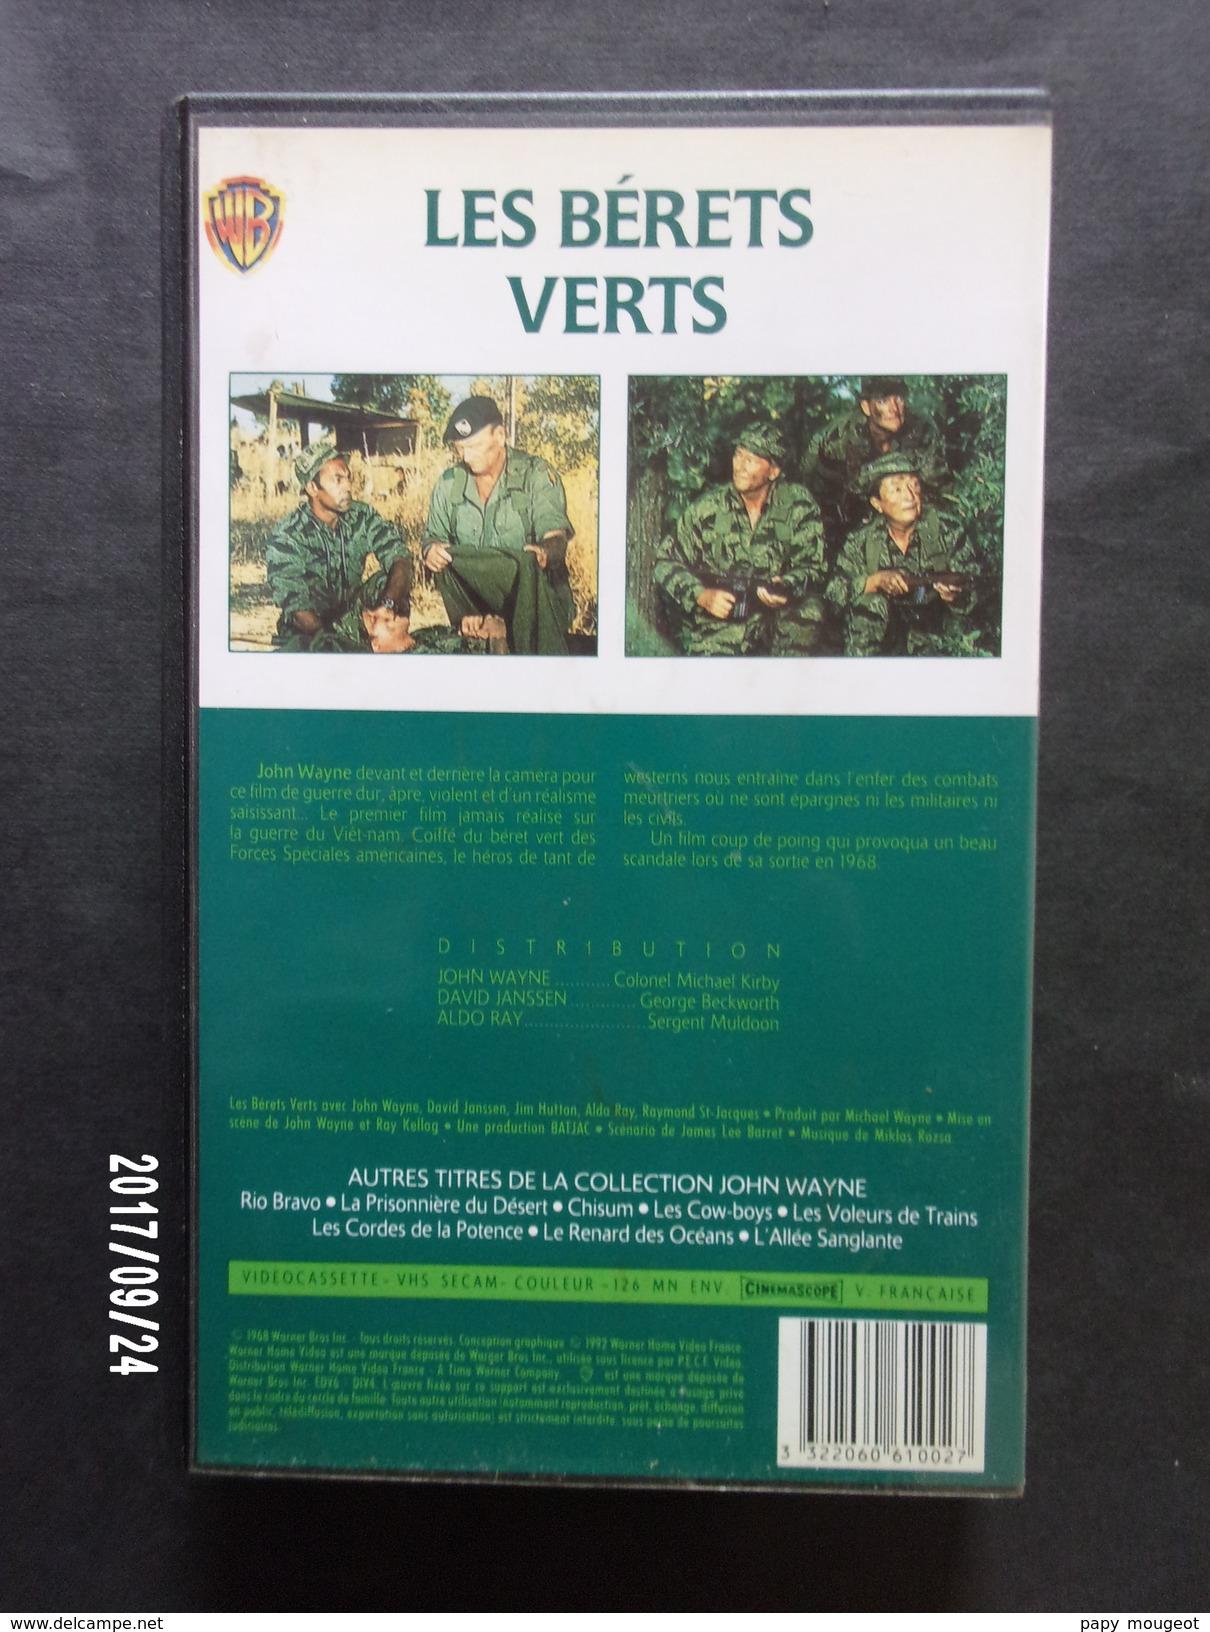 Les Bérets Verts - Geschichte